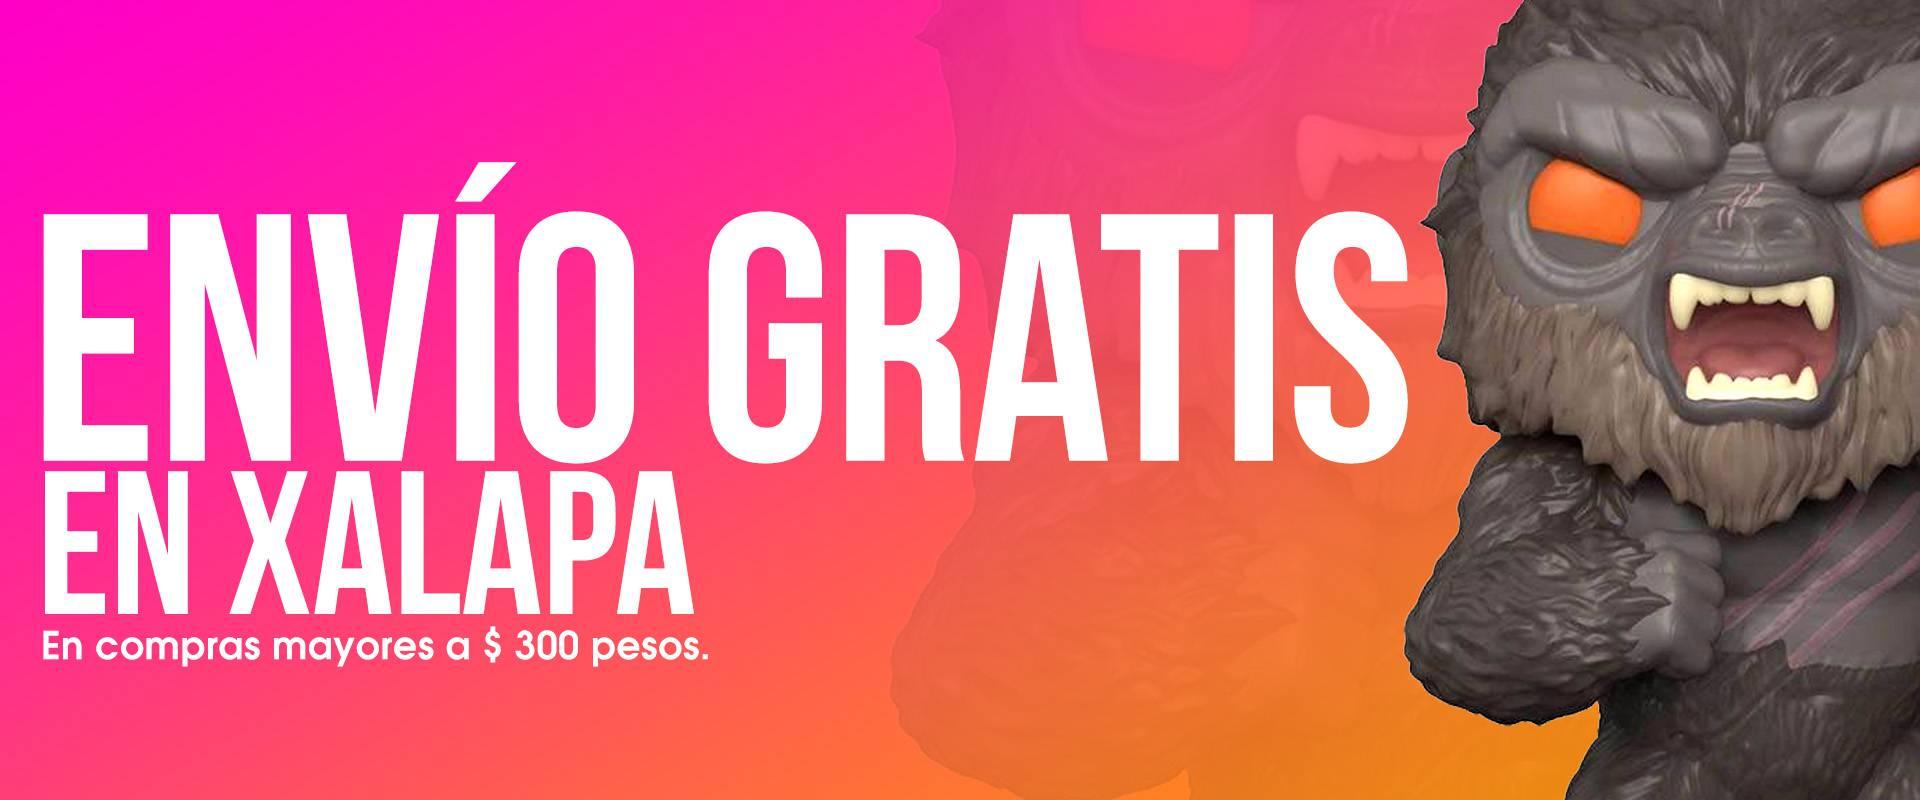 ¡Envio Gratis en Xalapa!